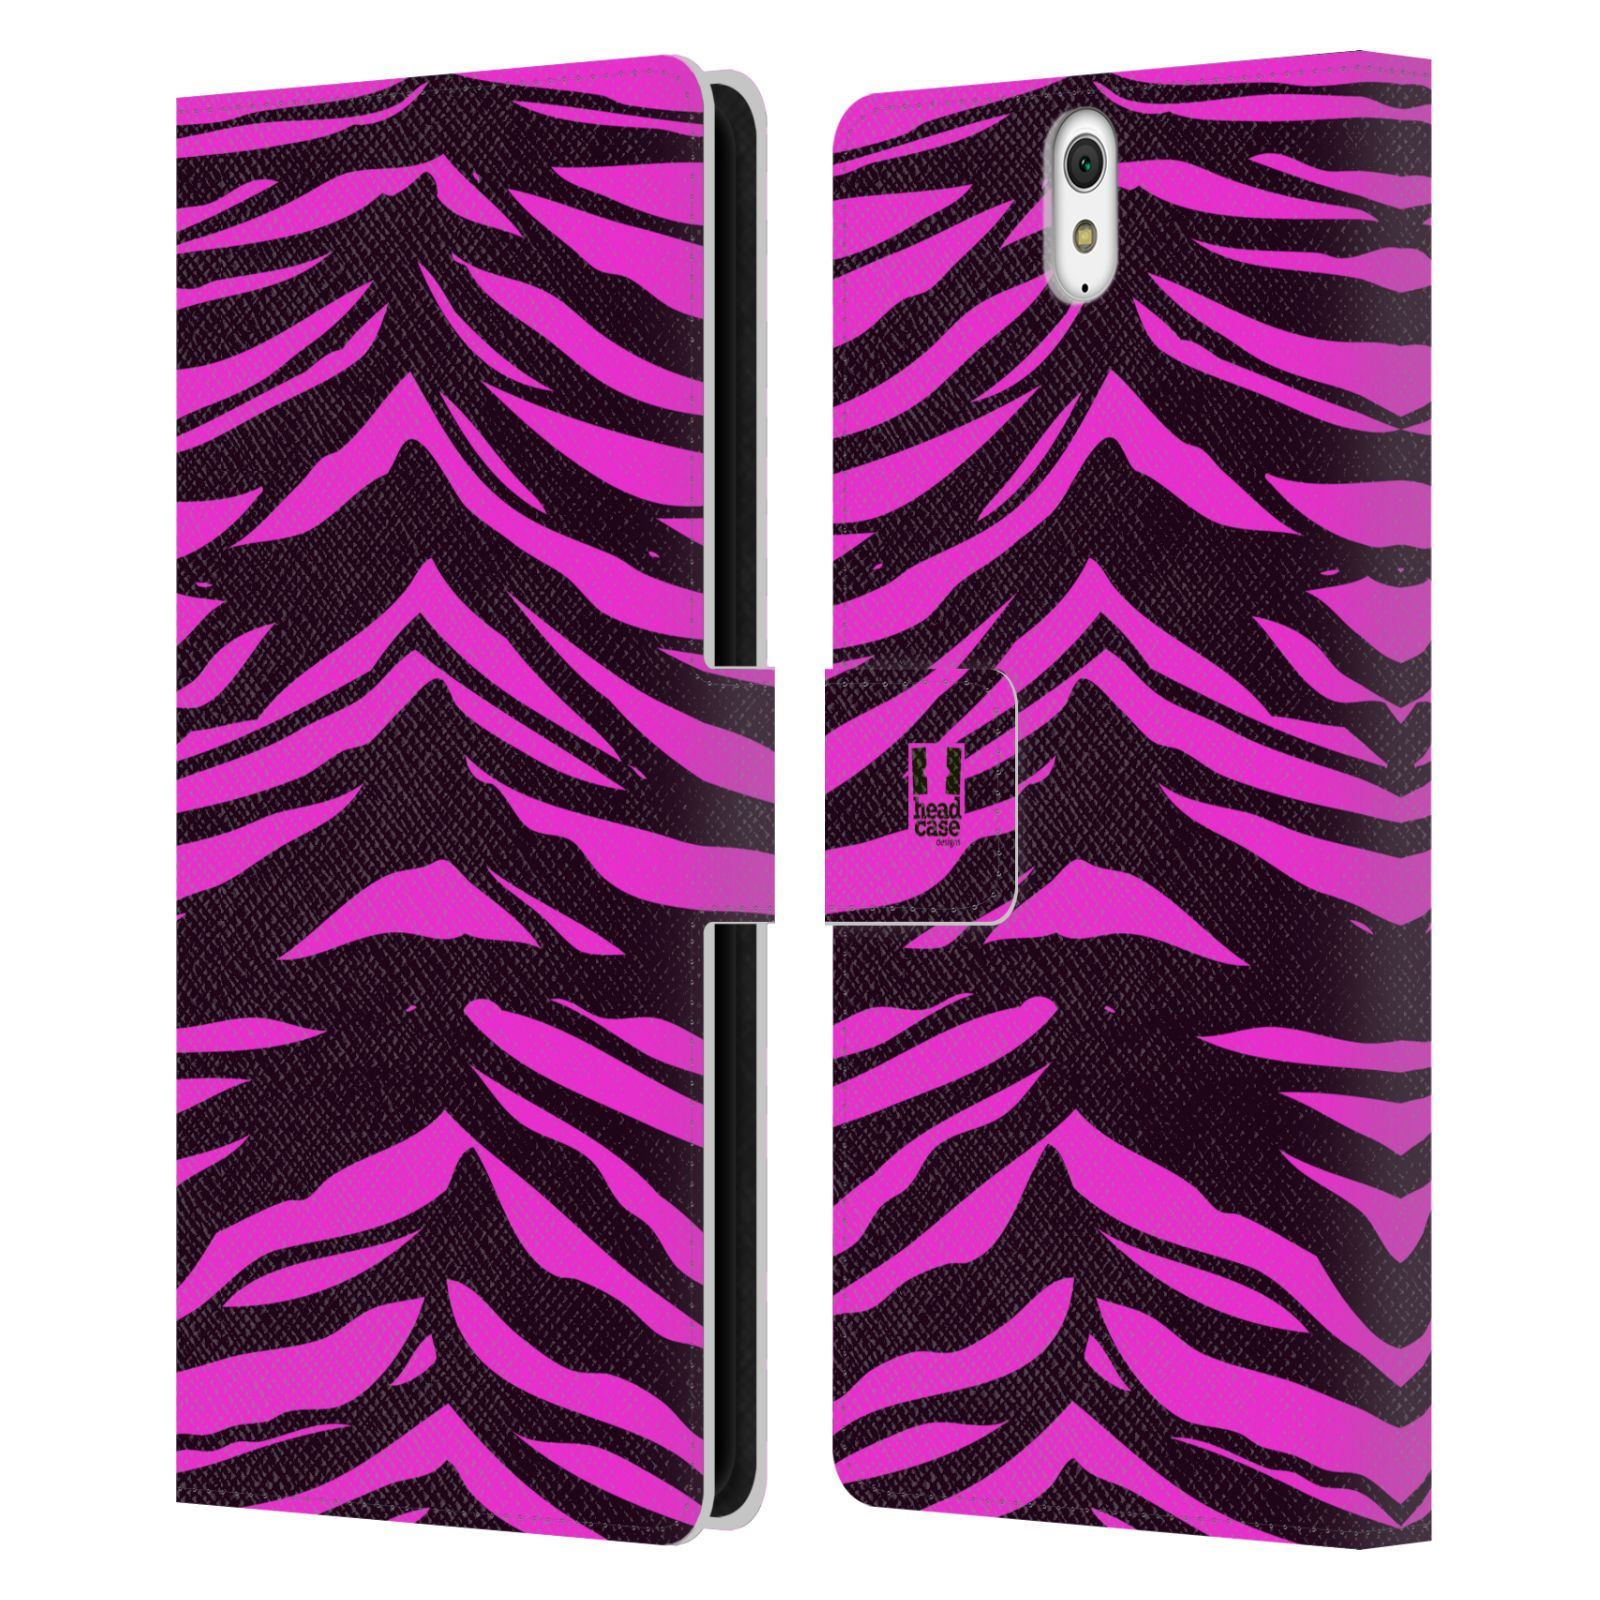 HEAD CASE Flipové pouzdro pro mobil SONY XPERIA C5 Ultra Zvířecí barevné vzory fialová tygr